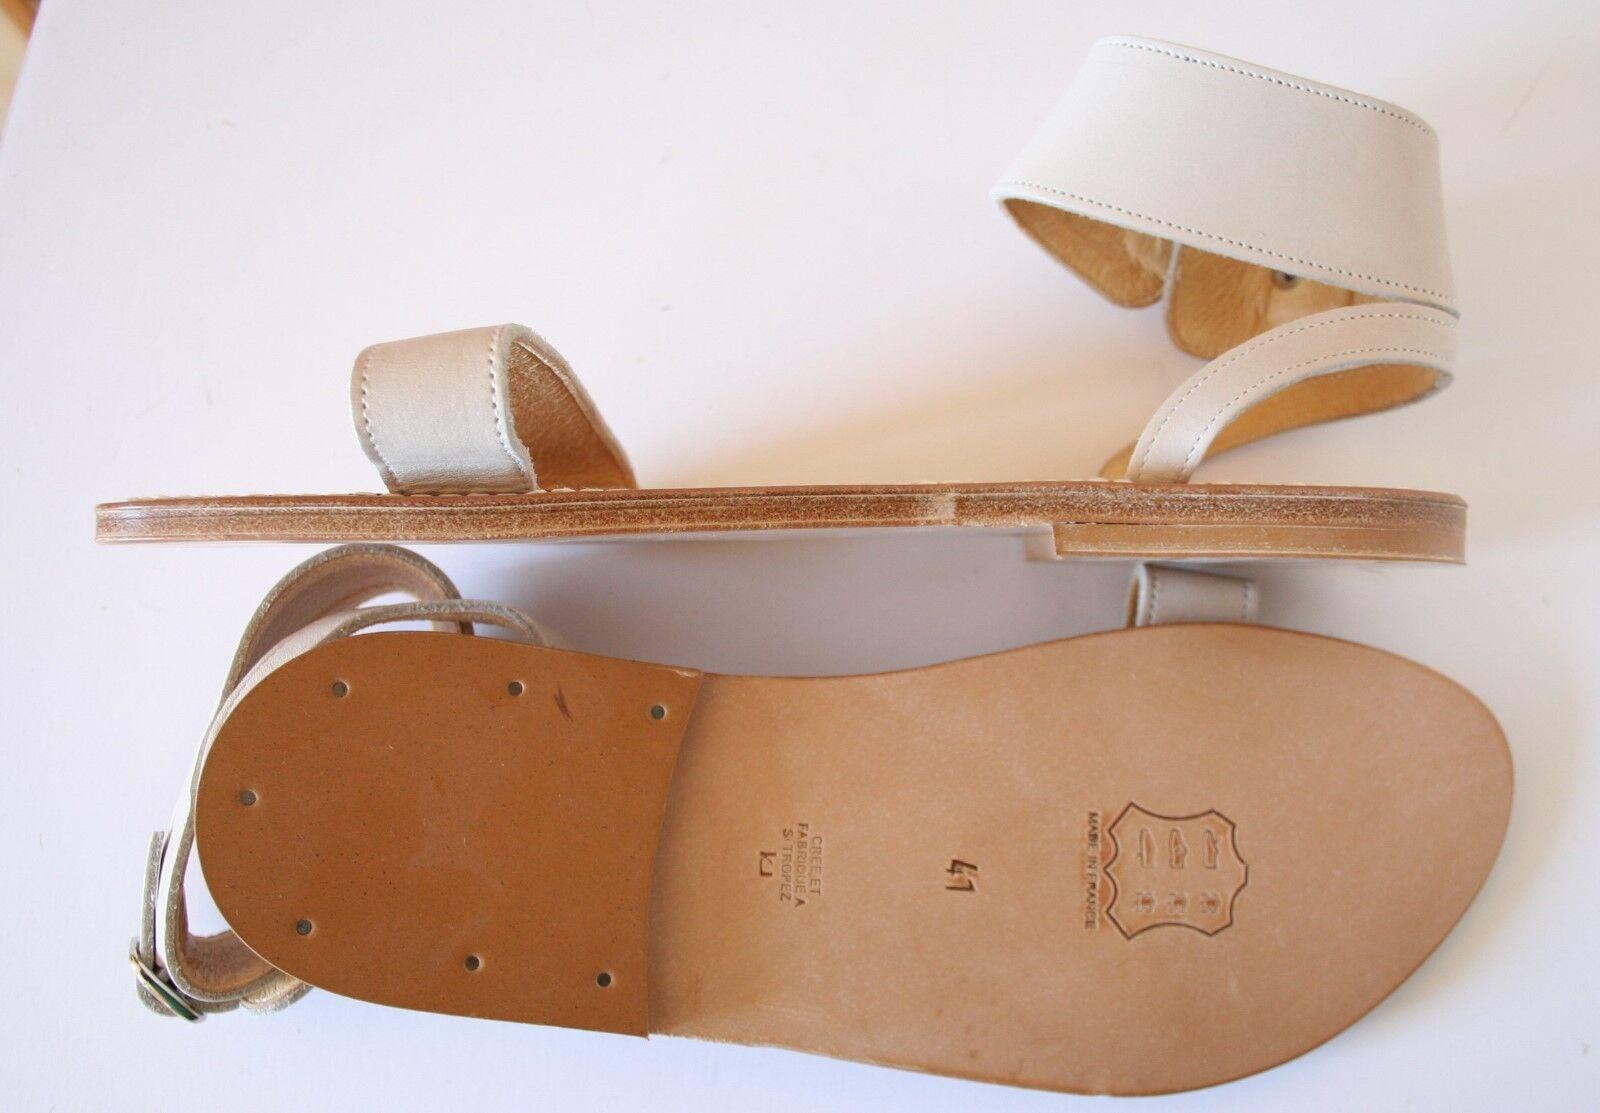 K. K. K. Jacques för J.Crew Saratoga läder Sandals 41.5 -11 Cream Ankle Cuff Strap  butikshantering